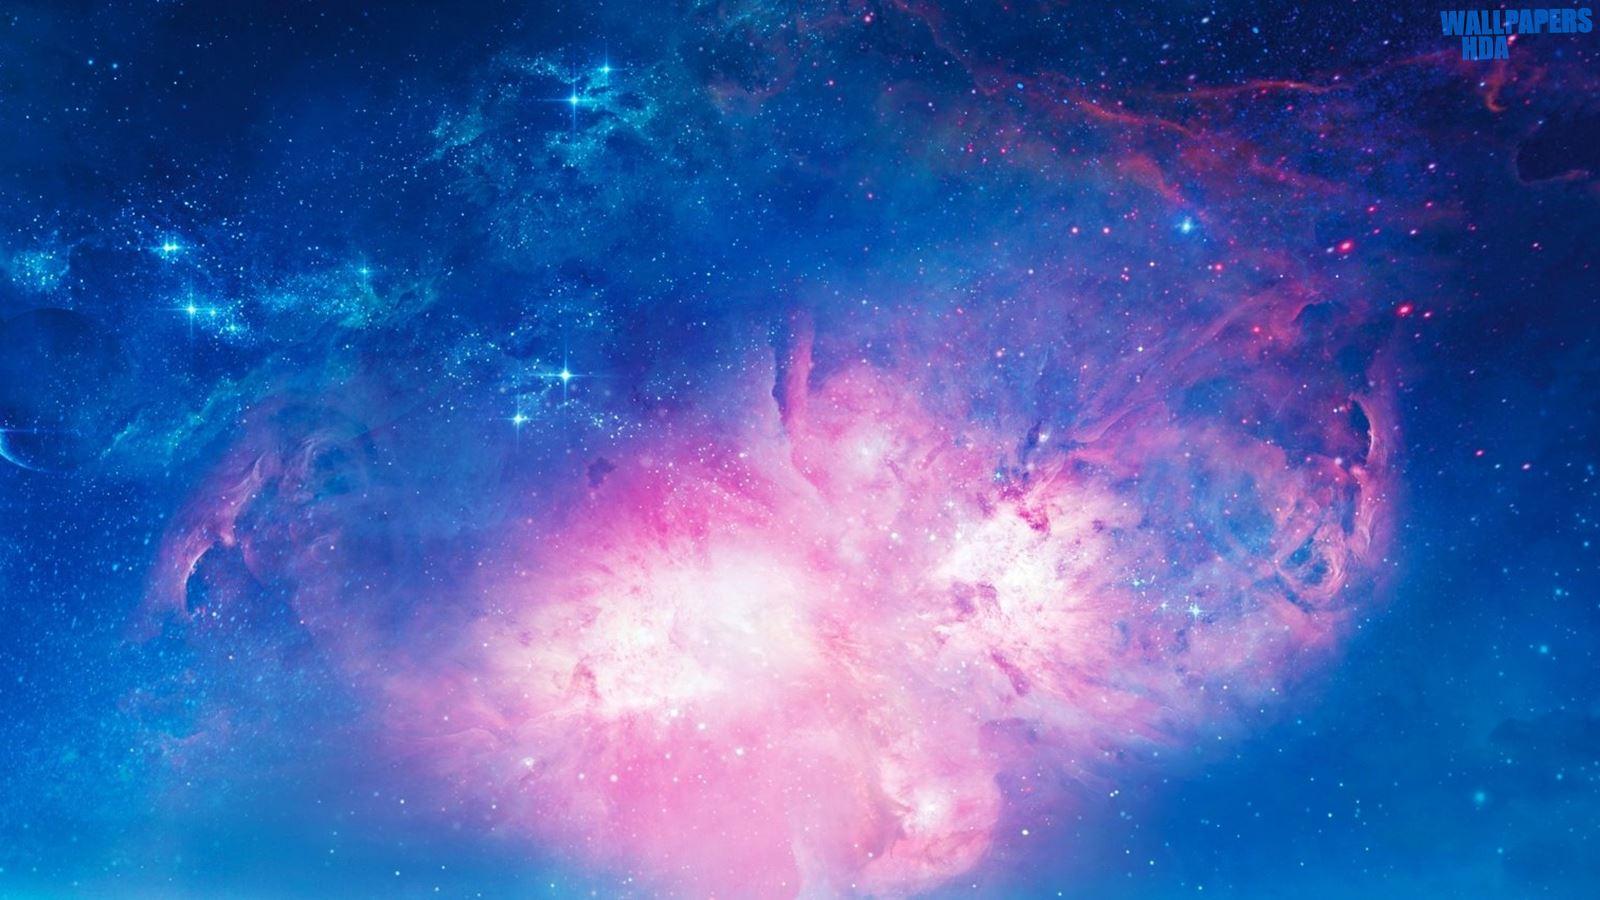 Guardians of the galaxy 3 wallpaper 1600900 Wallpaper 29 HD 1600x900